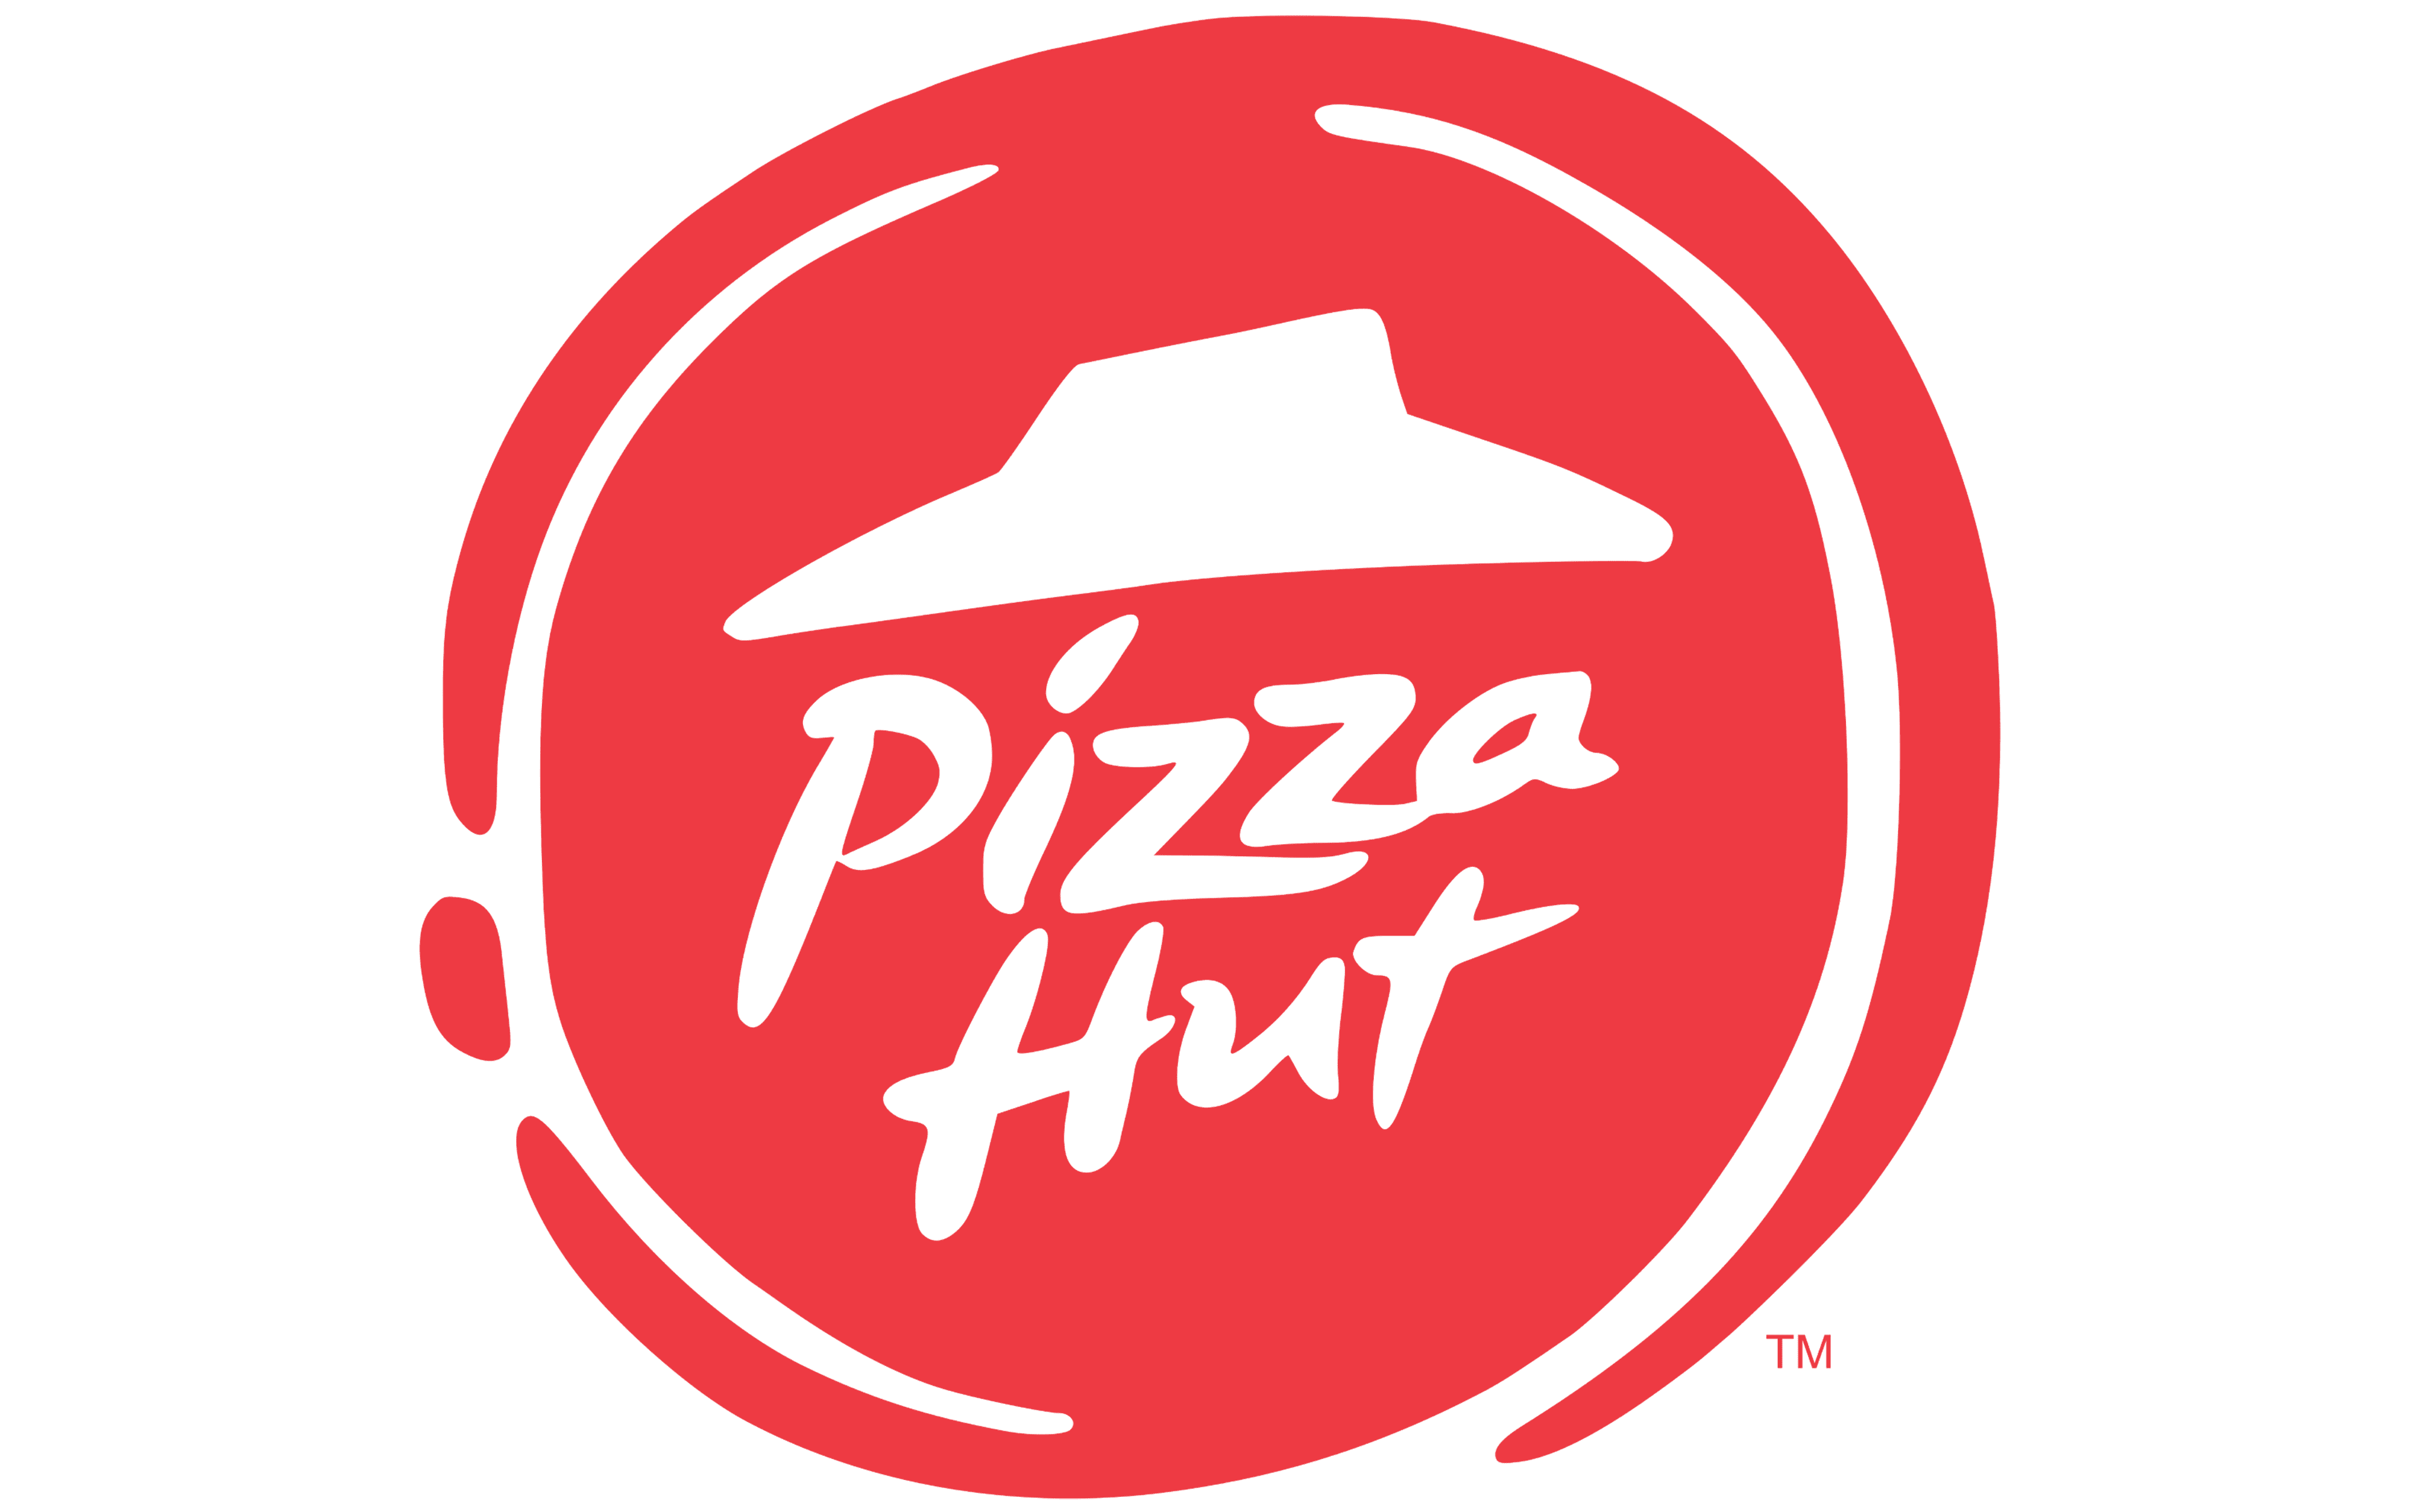 Pizza-Hut-Logo-1 (2)